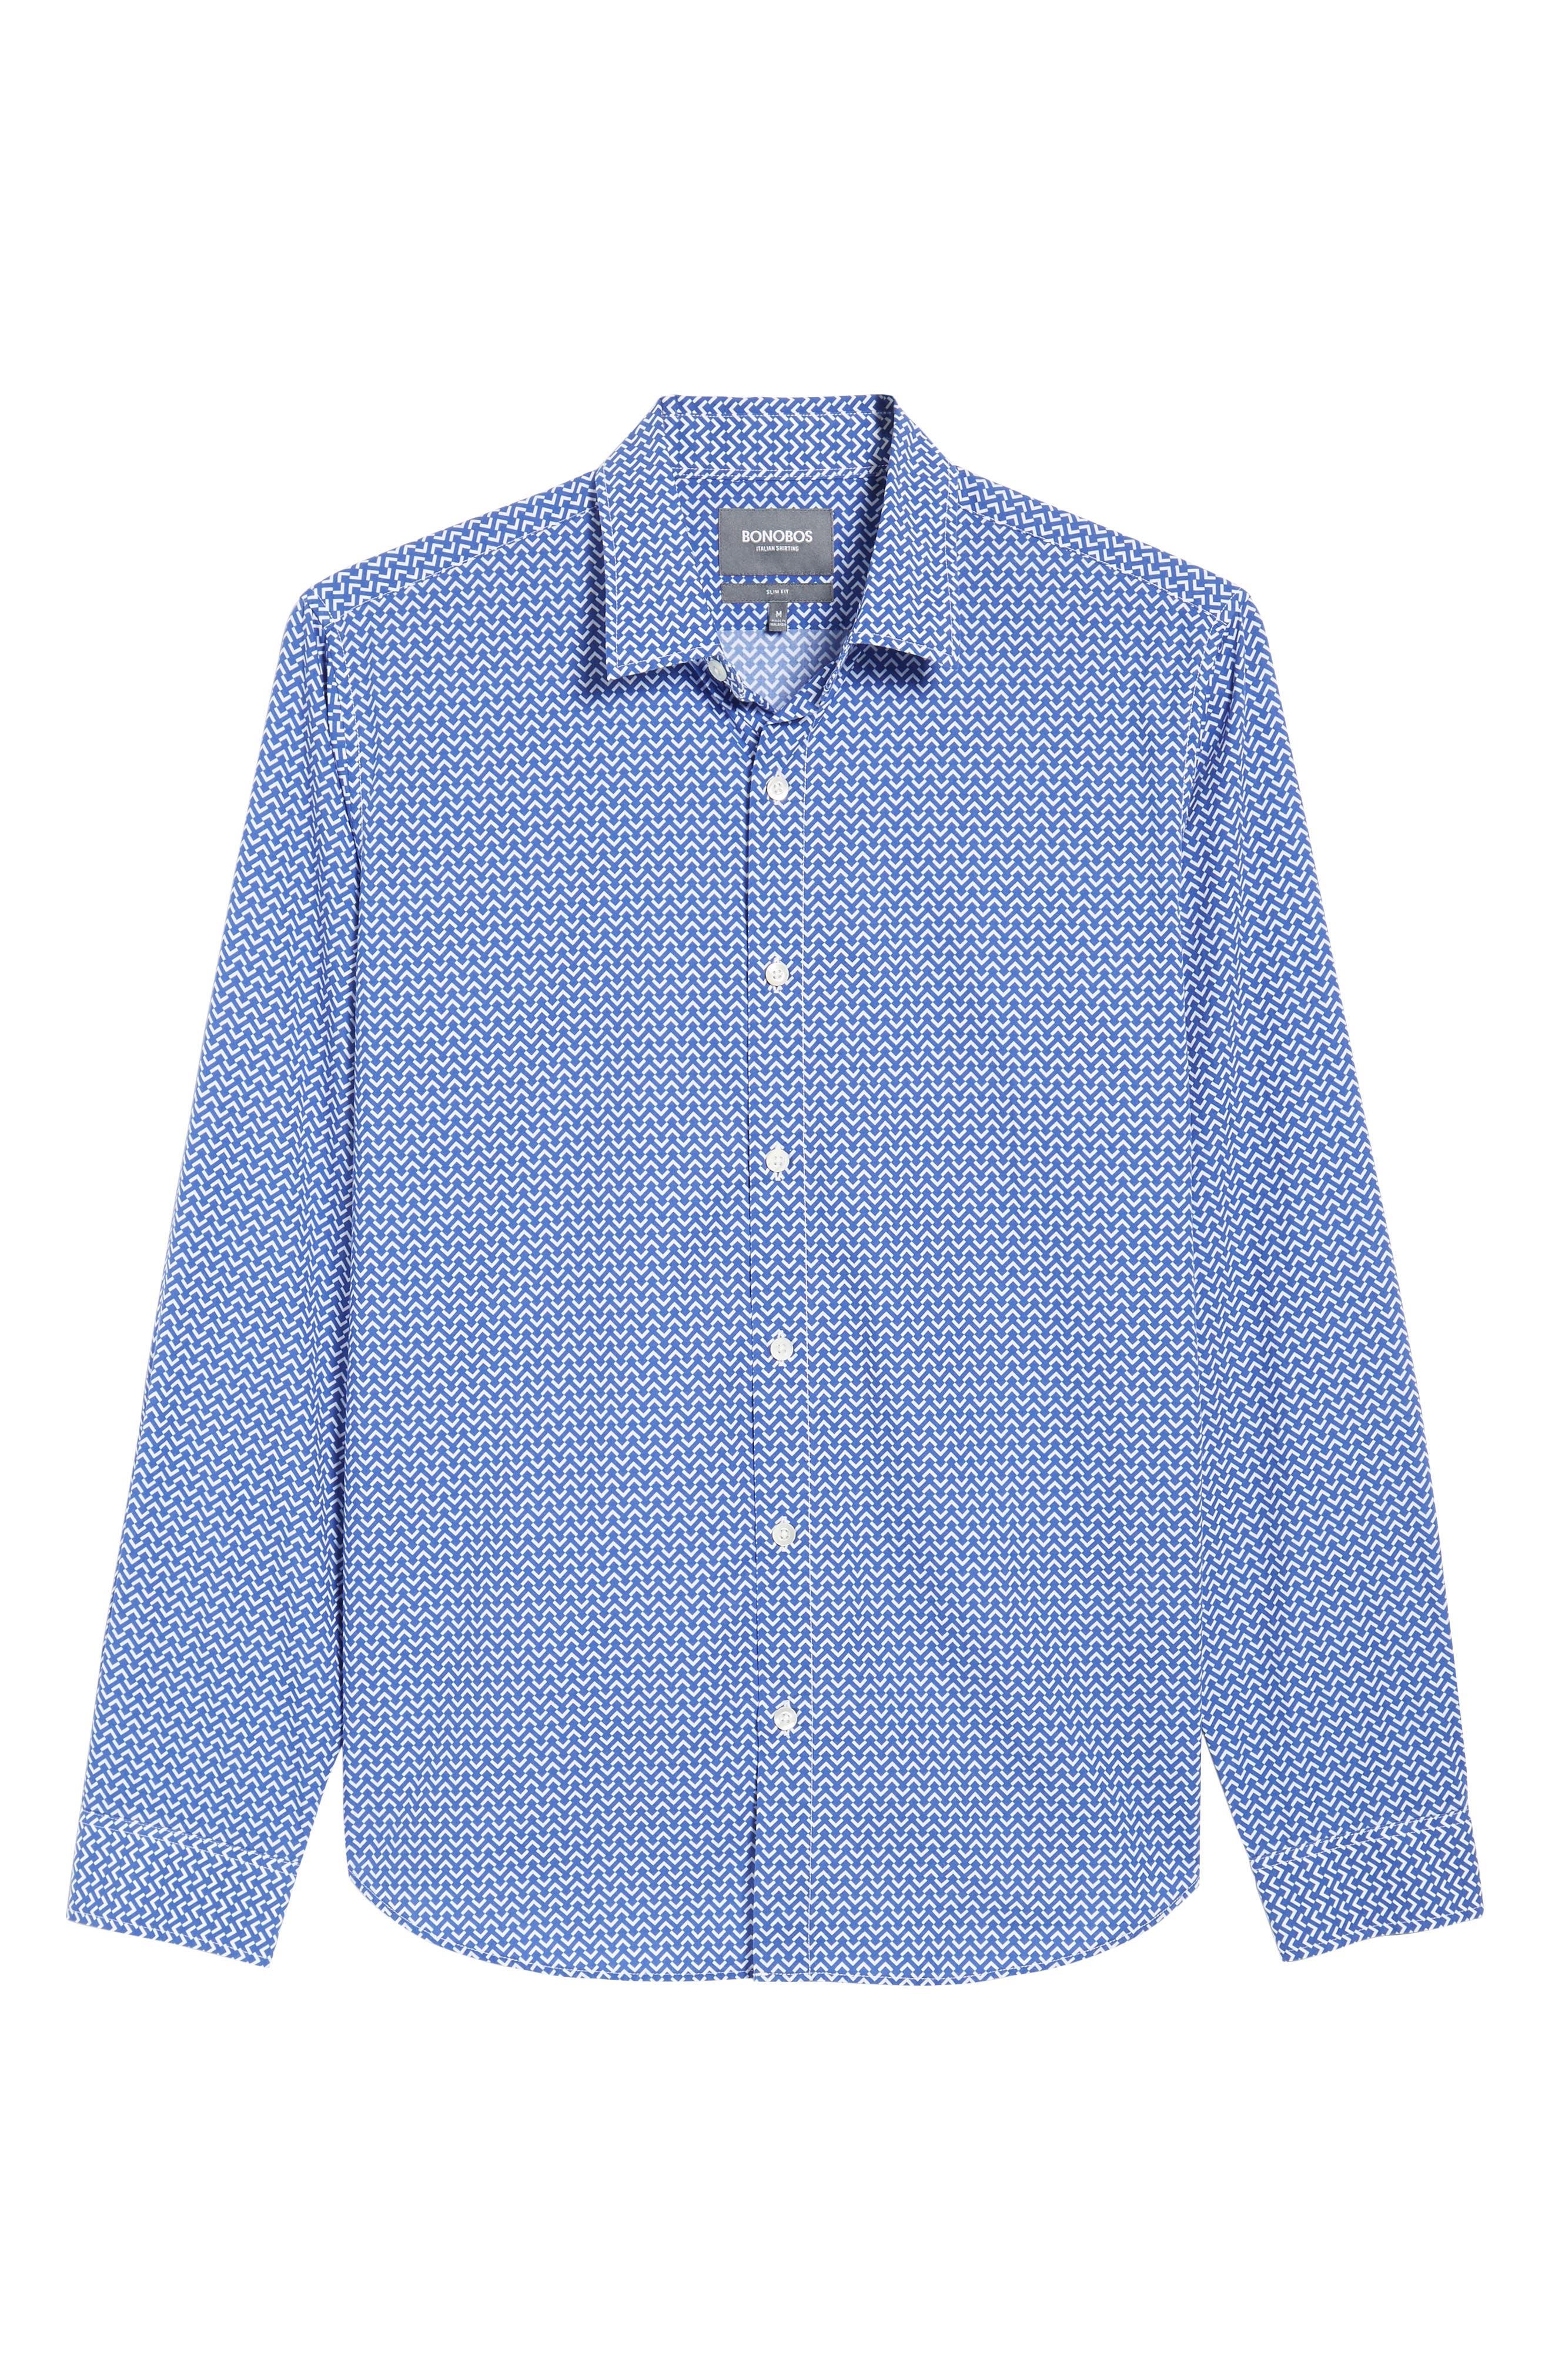 Premium Slim Fit Print Sport Shirt,                             Alternate thumbnail 6, color,                             400